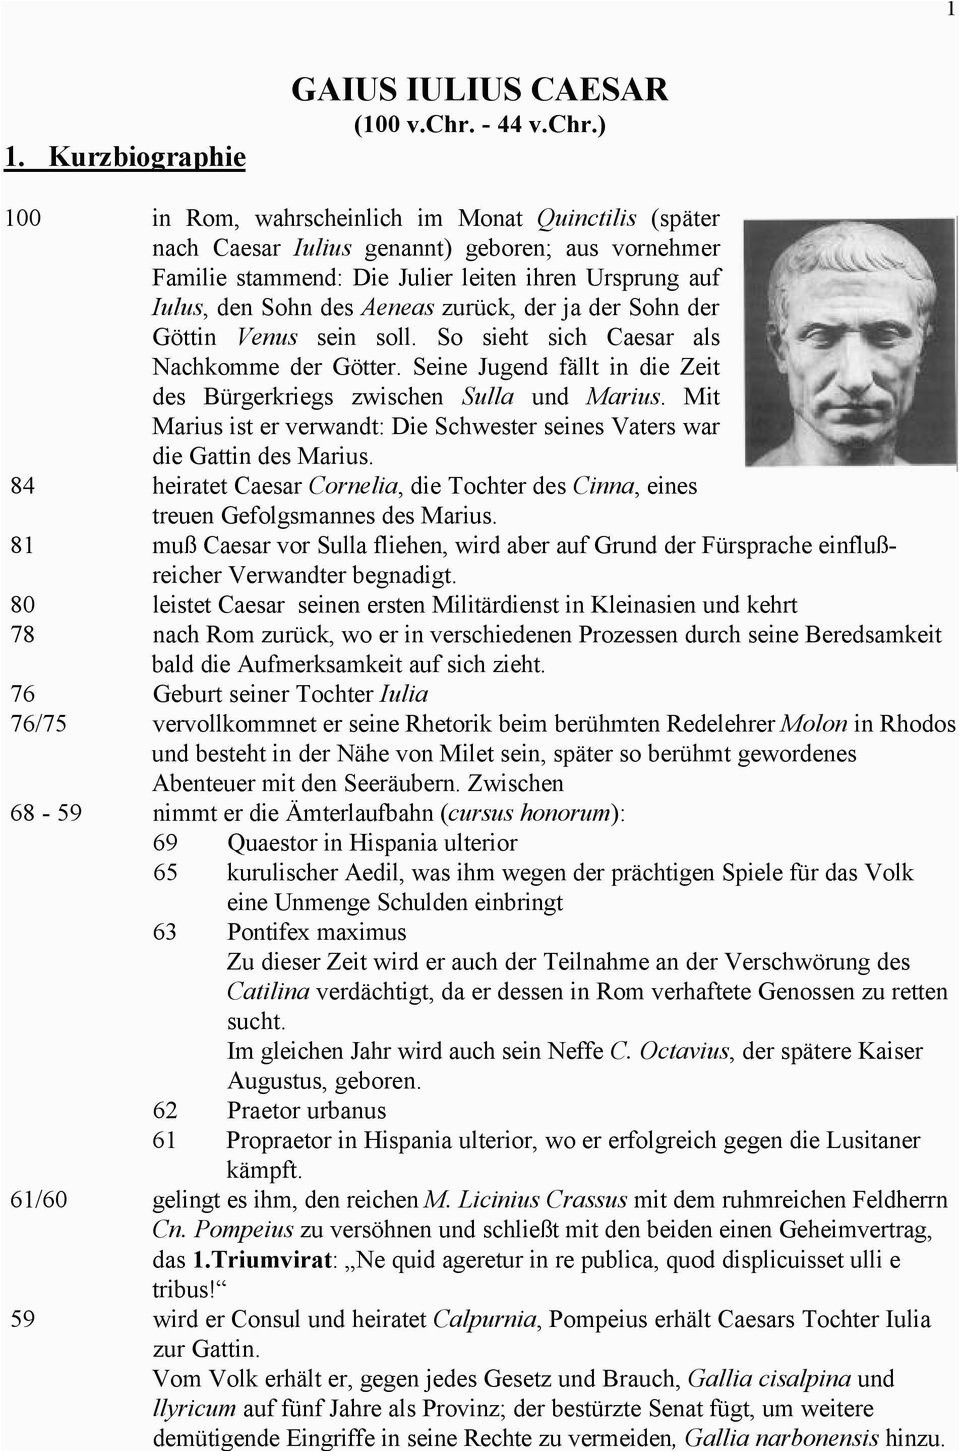 Gaius iulius caesar 100 v chr 44 v chr